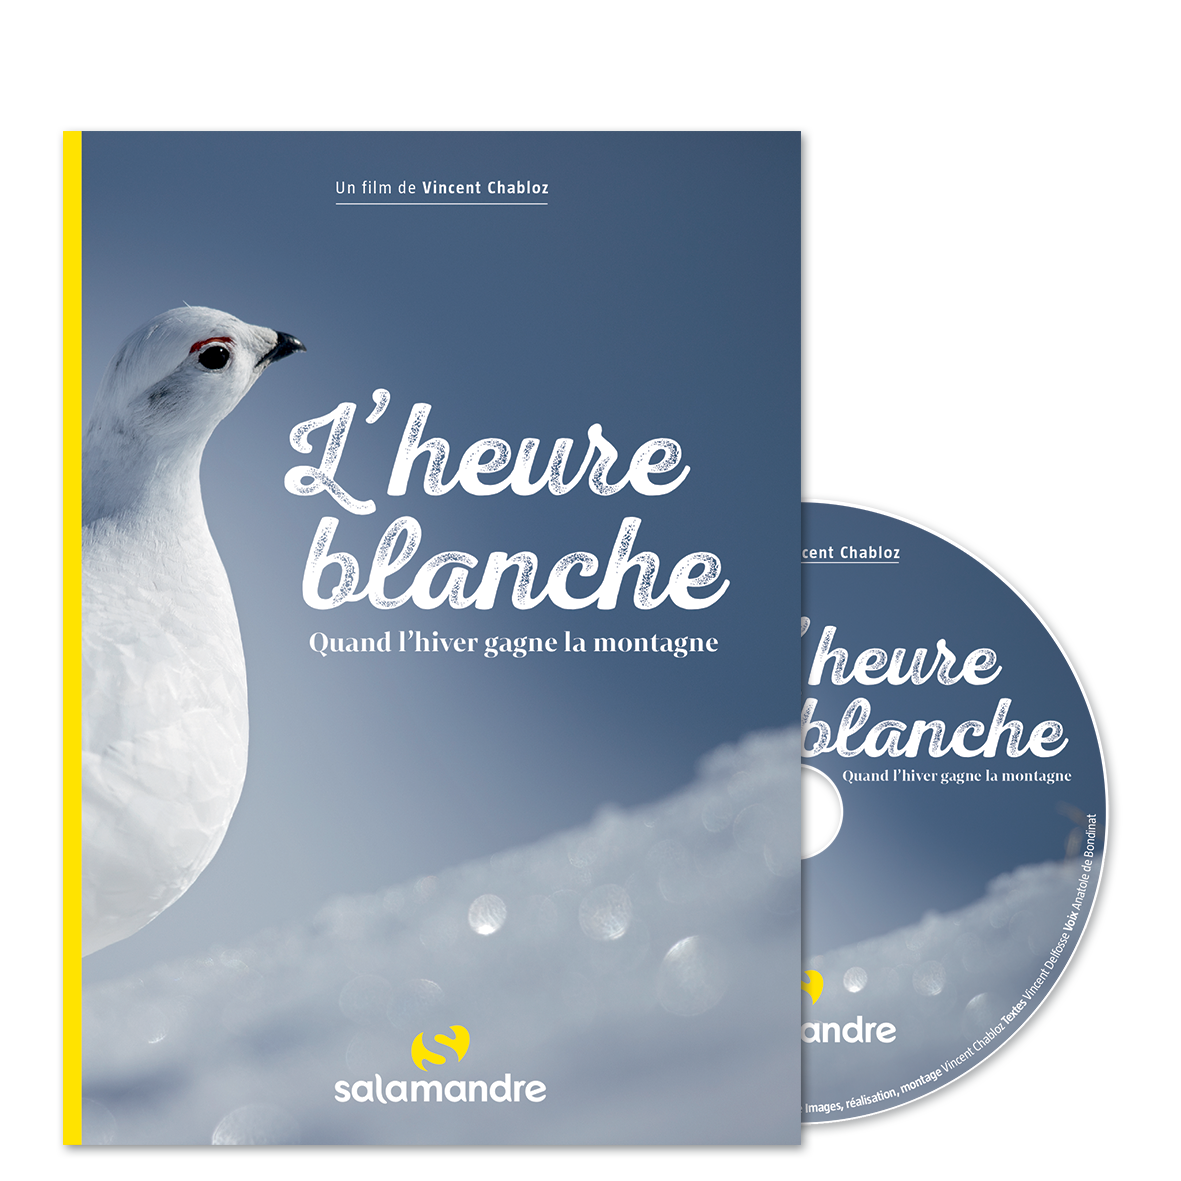 https://master.salamandre.net/media/22011/DVD_Pack_HeureBlanche_s.png